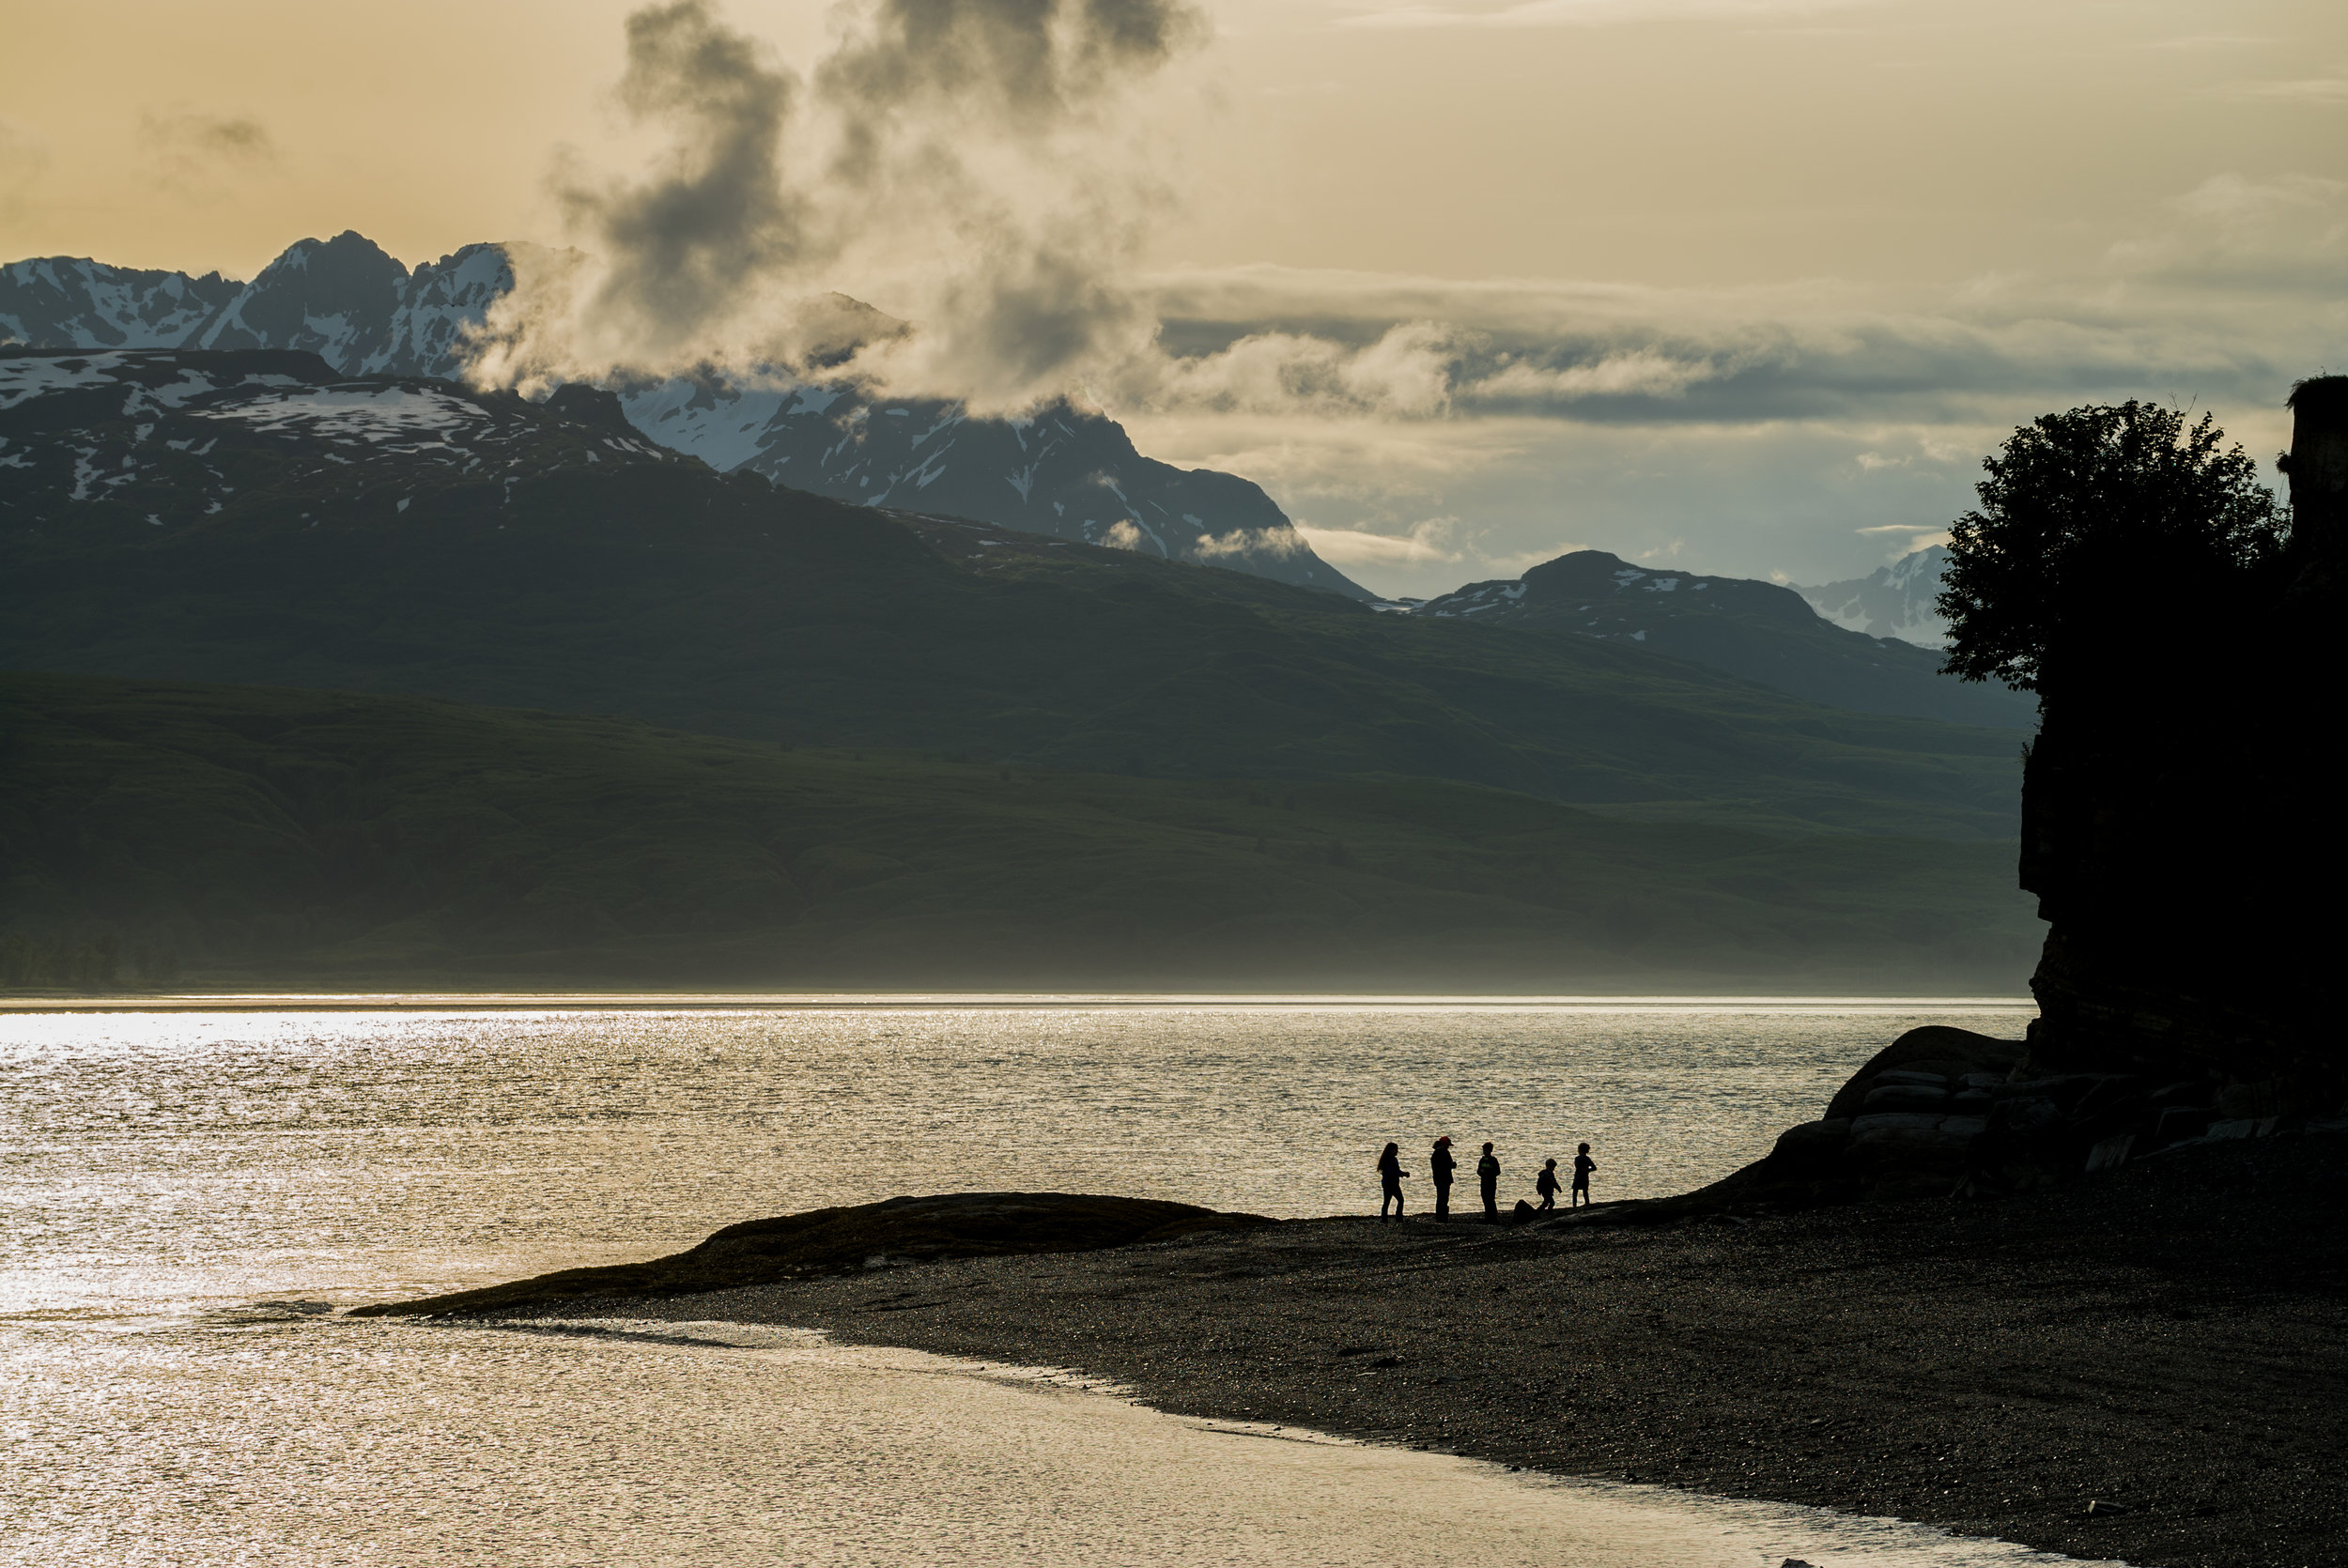 snug-harbor-alaska-Photo-by-Aaron-Minks-DSC06676-Edit.jpg